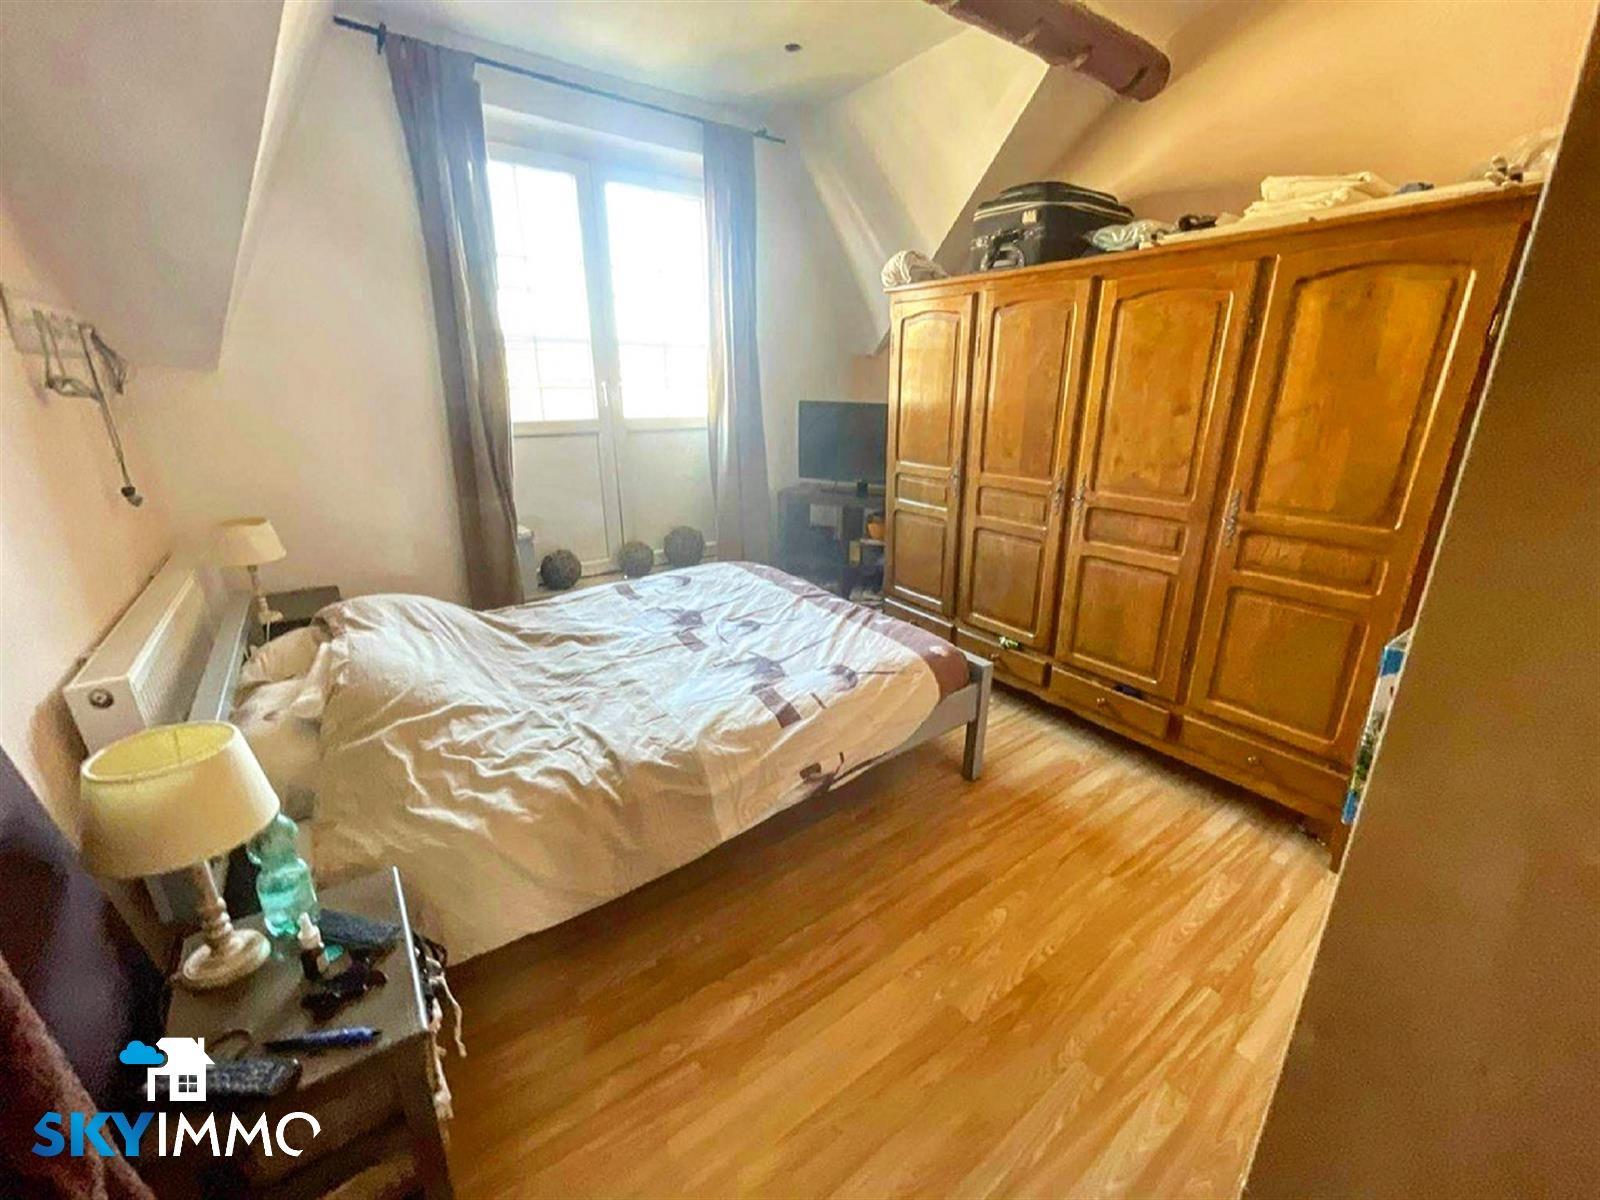 Maison - Seraing Jemeppesur-Meuse - #4343977-22